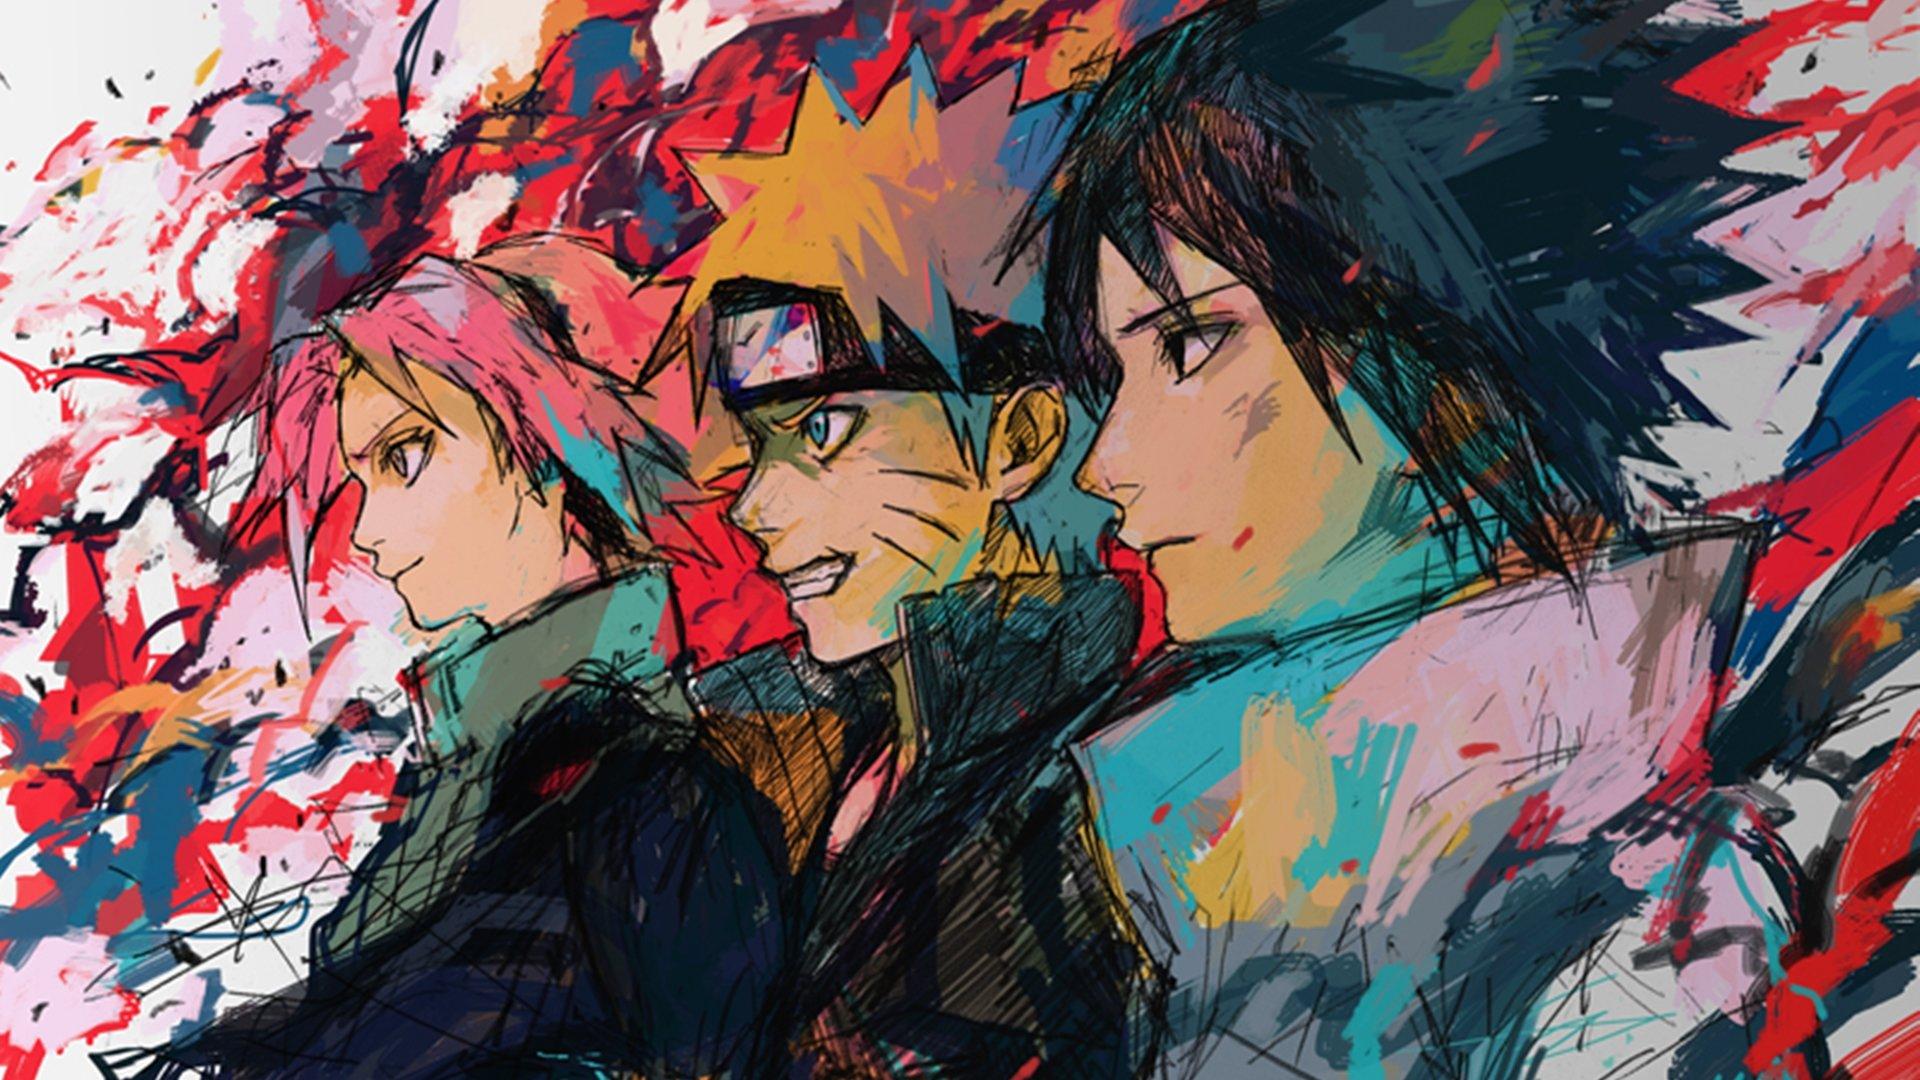 Naruto 1080p Wallpaper Posted By Samantha Sellers